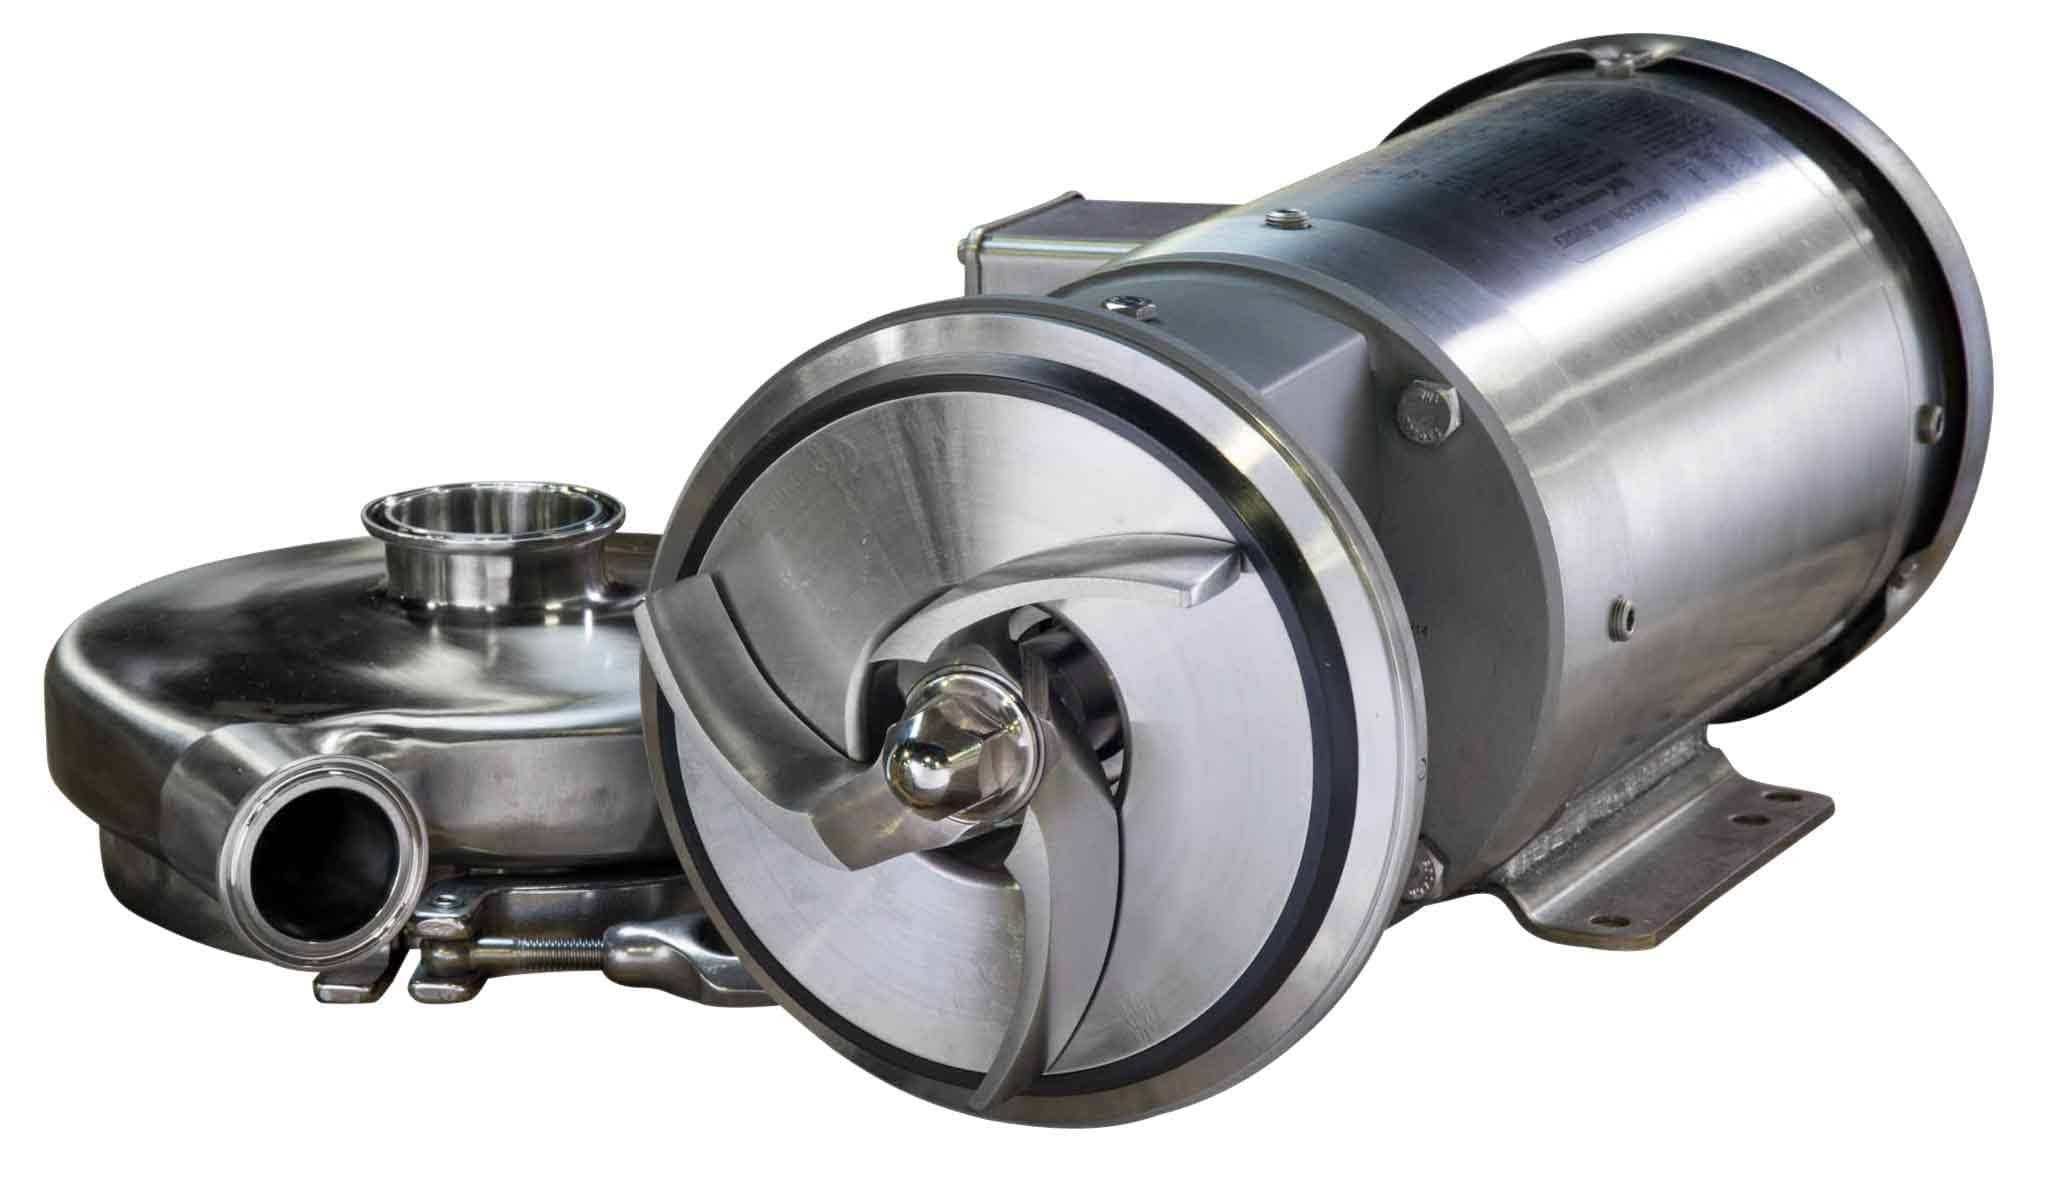 Ampco CB+ Craft Brew Pump